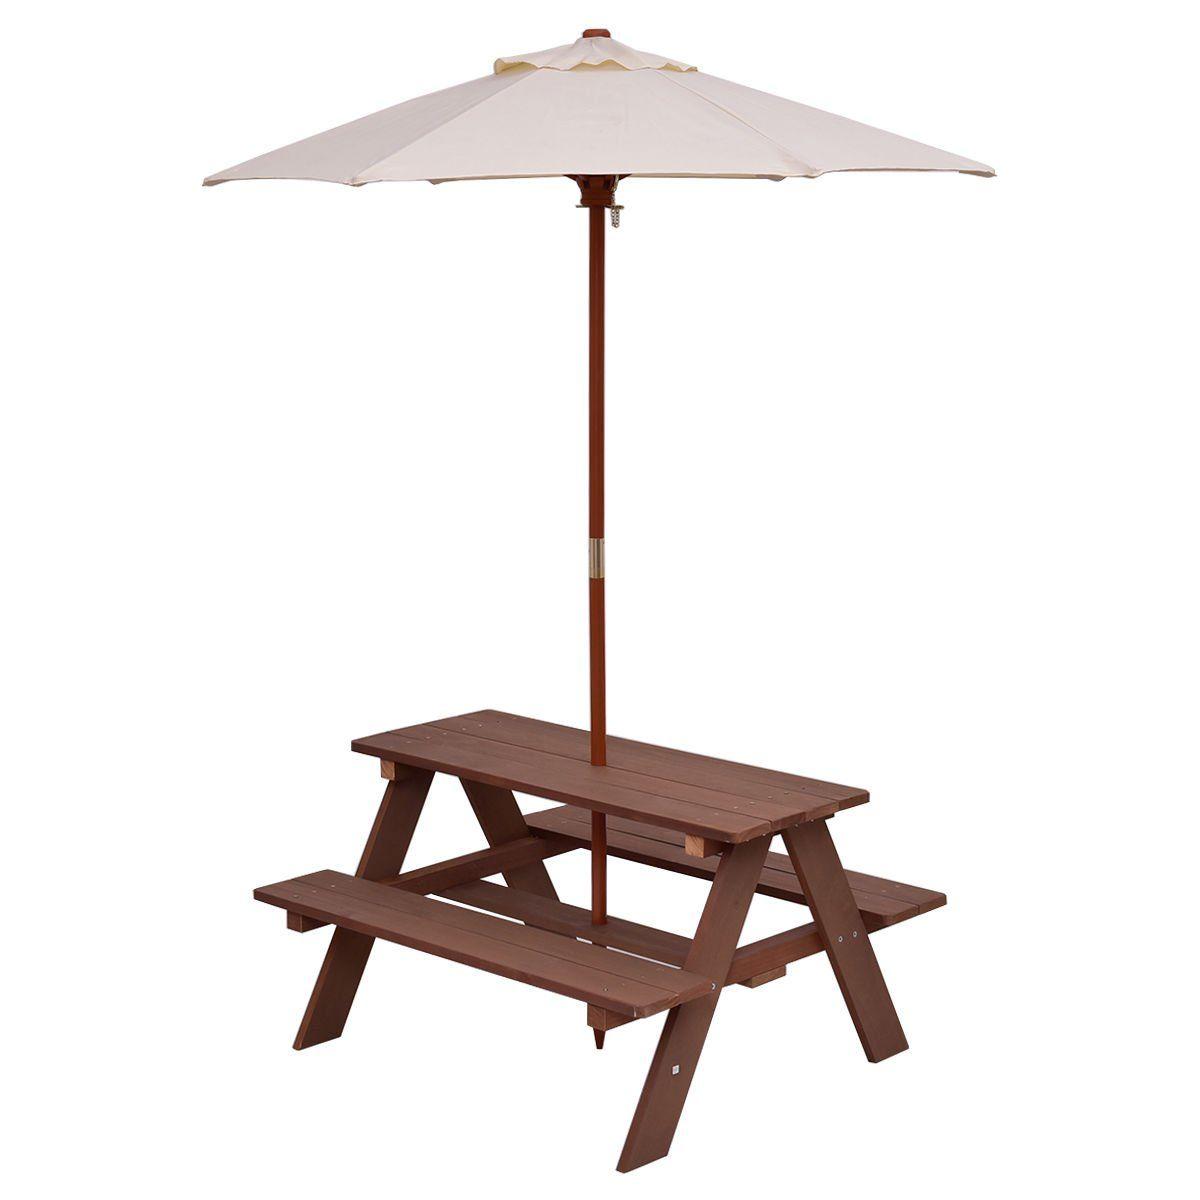 Costzon Kids Picnic Table Bench Set 4 Seat W Folding Umbrella